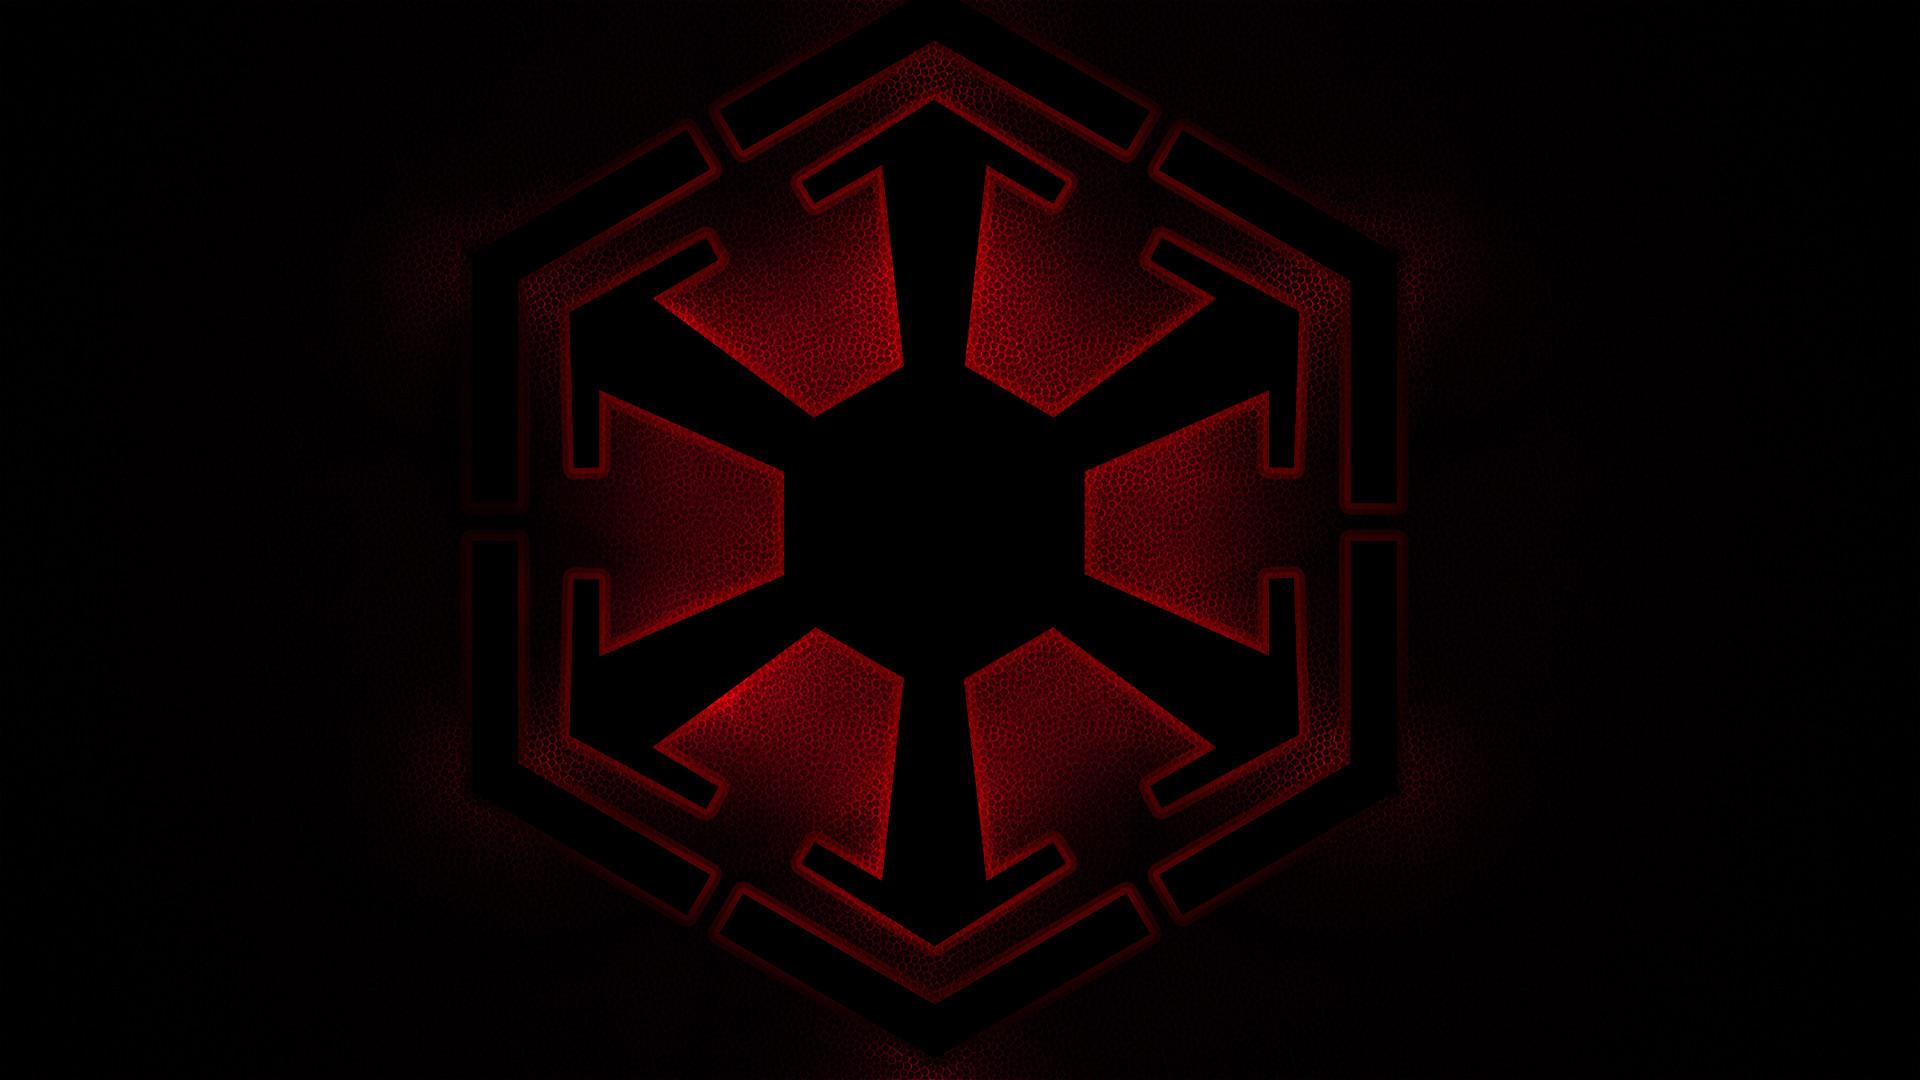 <b>Star Wars Sith</b> Image ~ Sdeerwallpaper